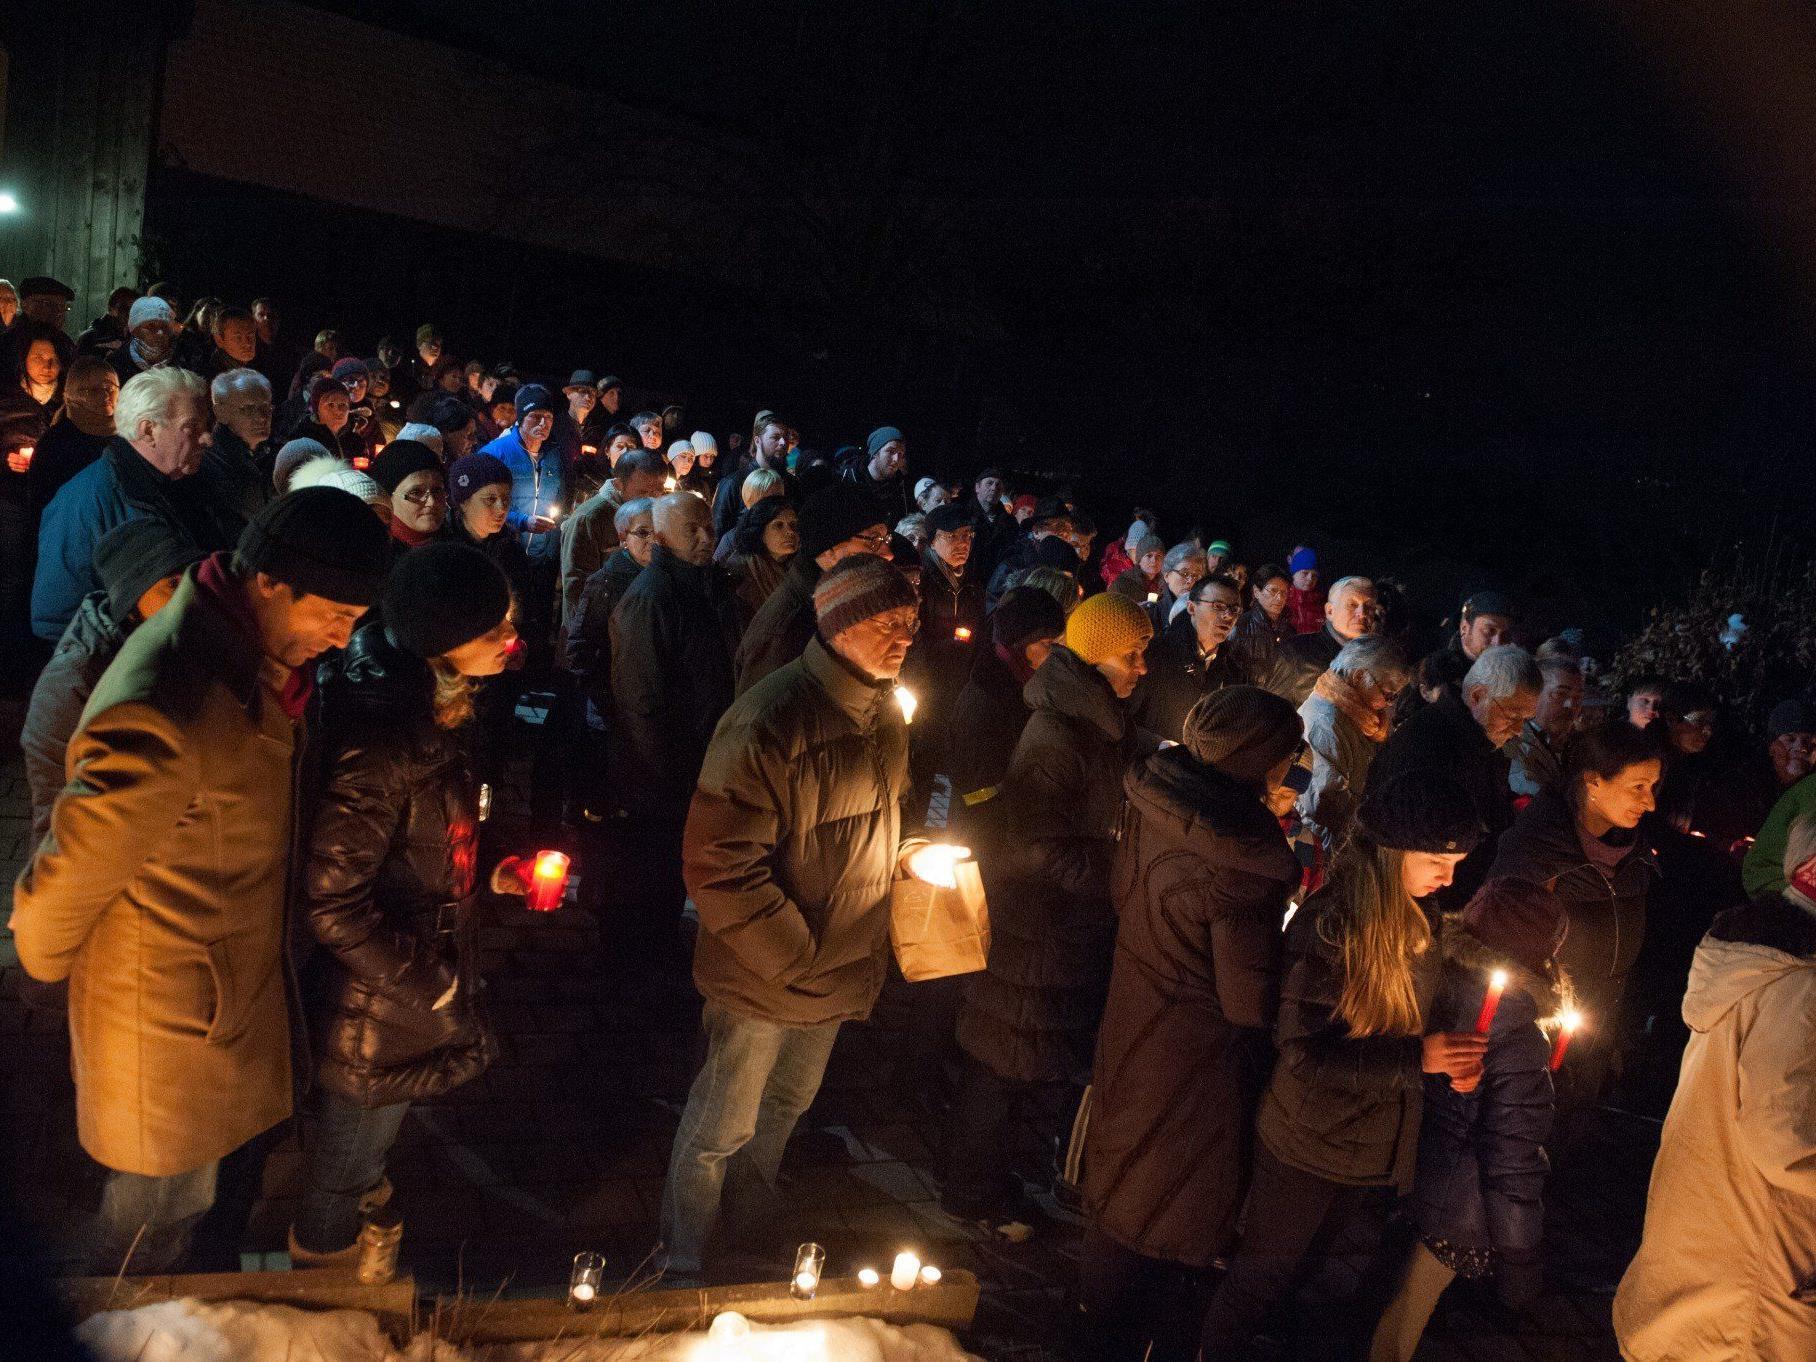 300 Menschen versammelten sich bei der gestrigen Solidaritätsaktion in Batschuns.